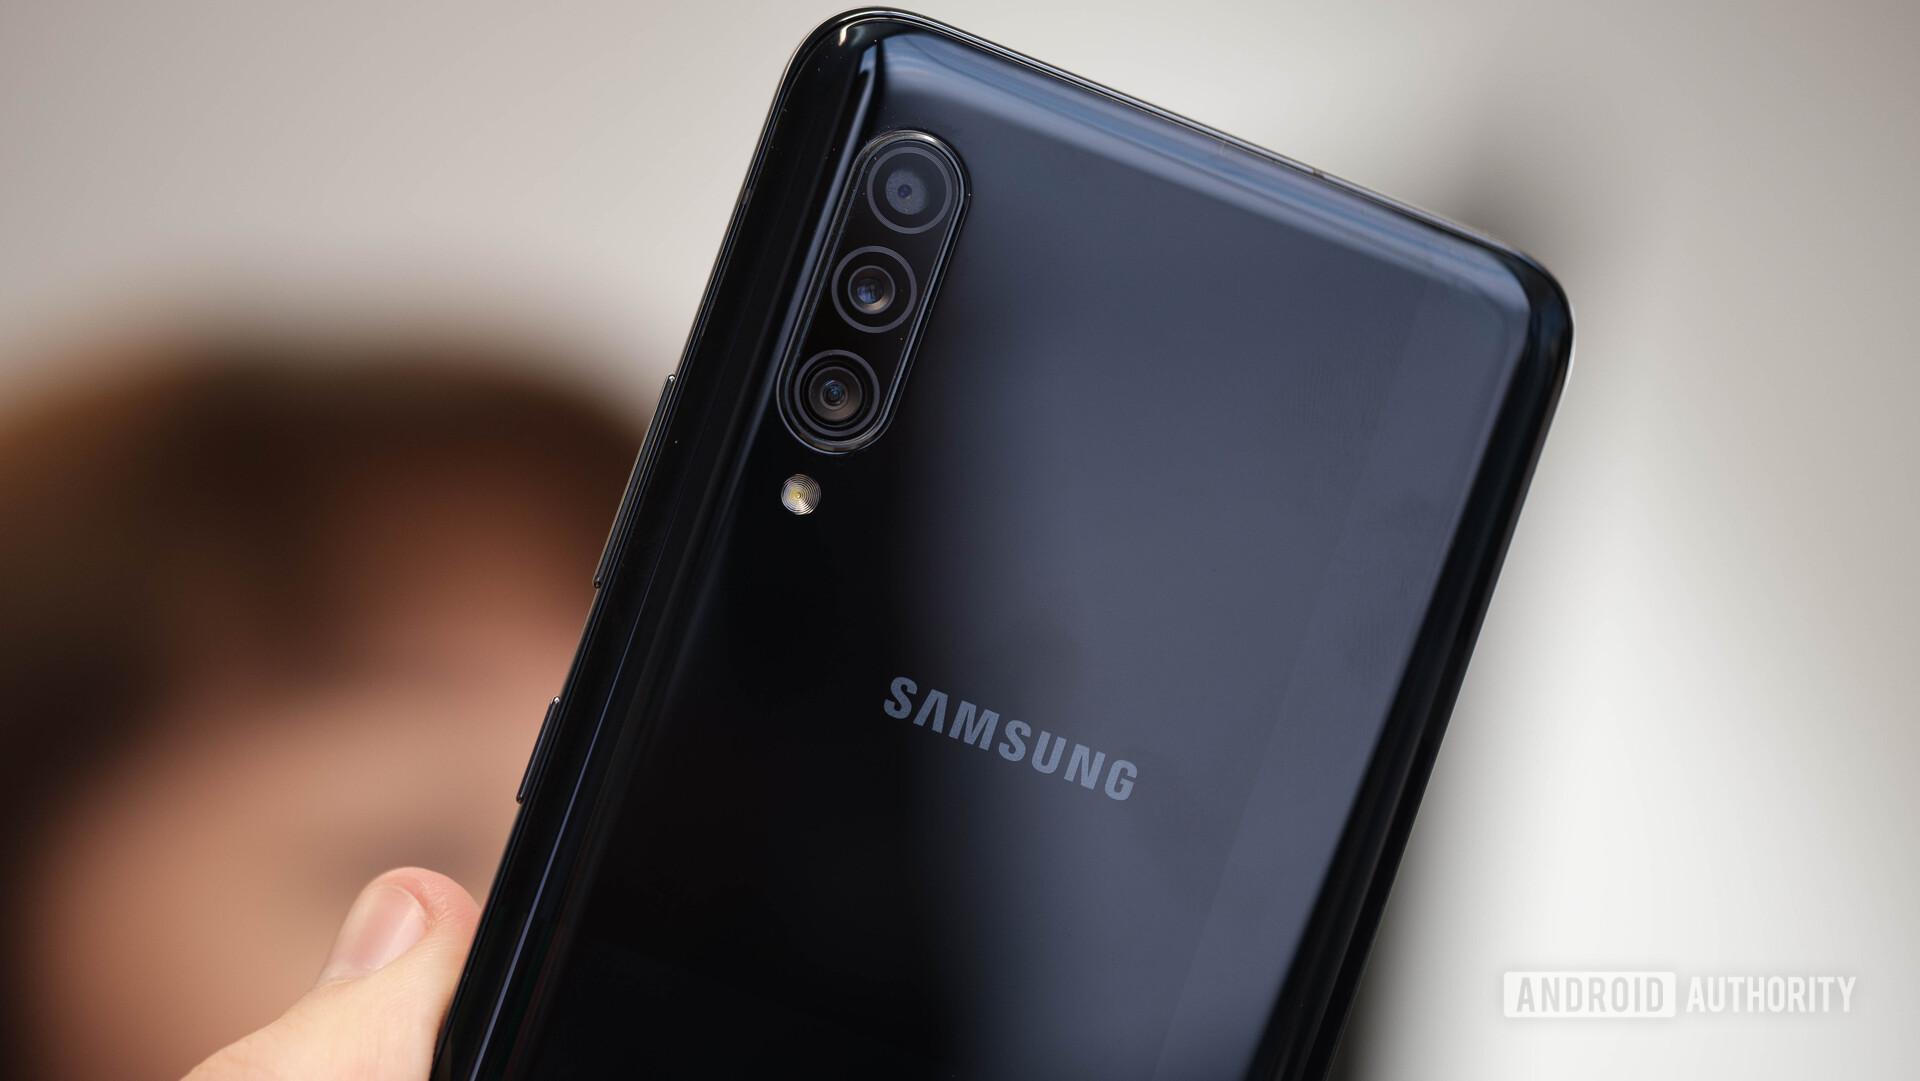 Samsung Galaxy A90 5G black back and camera array